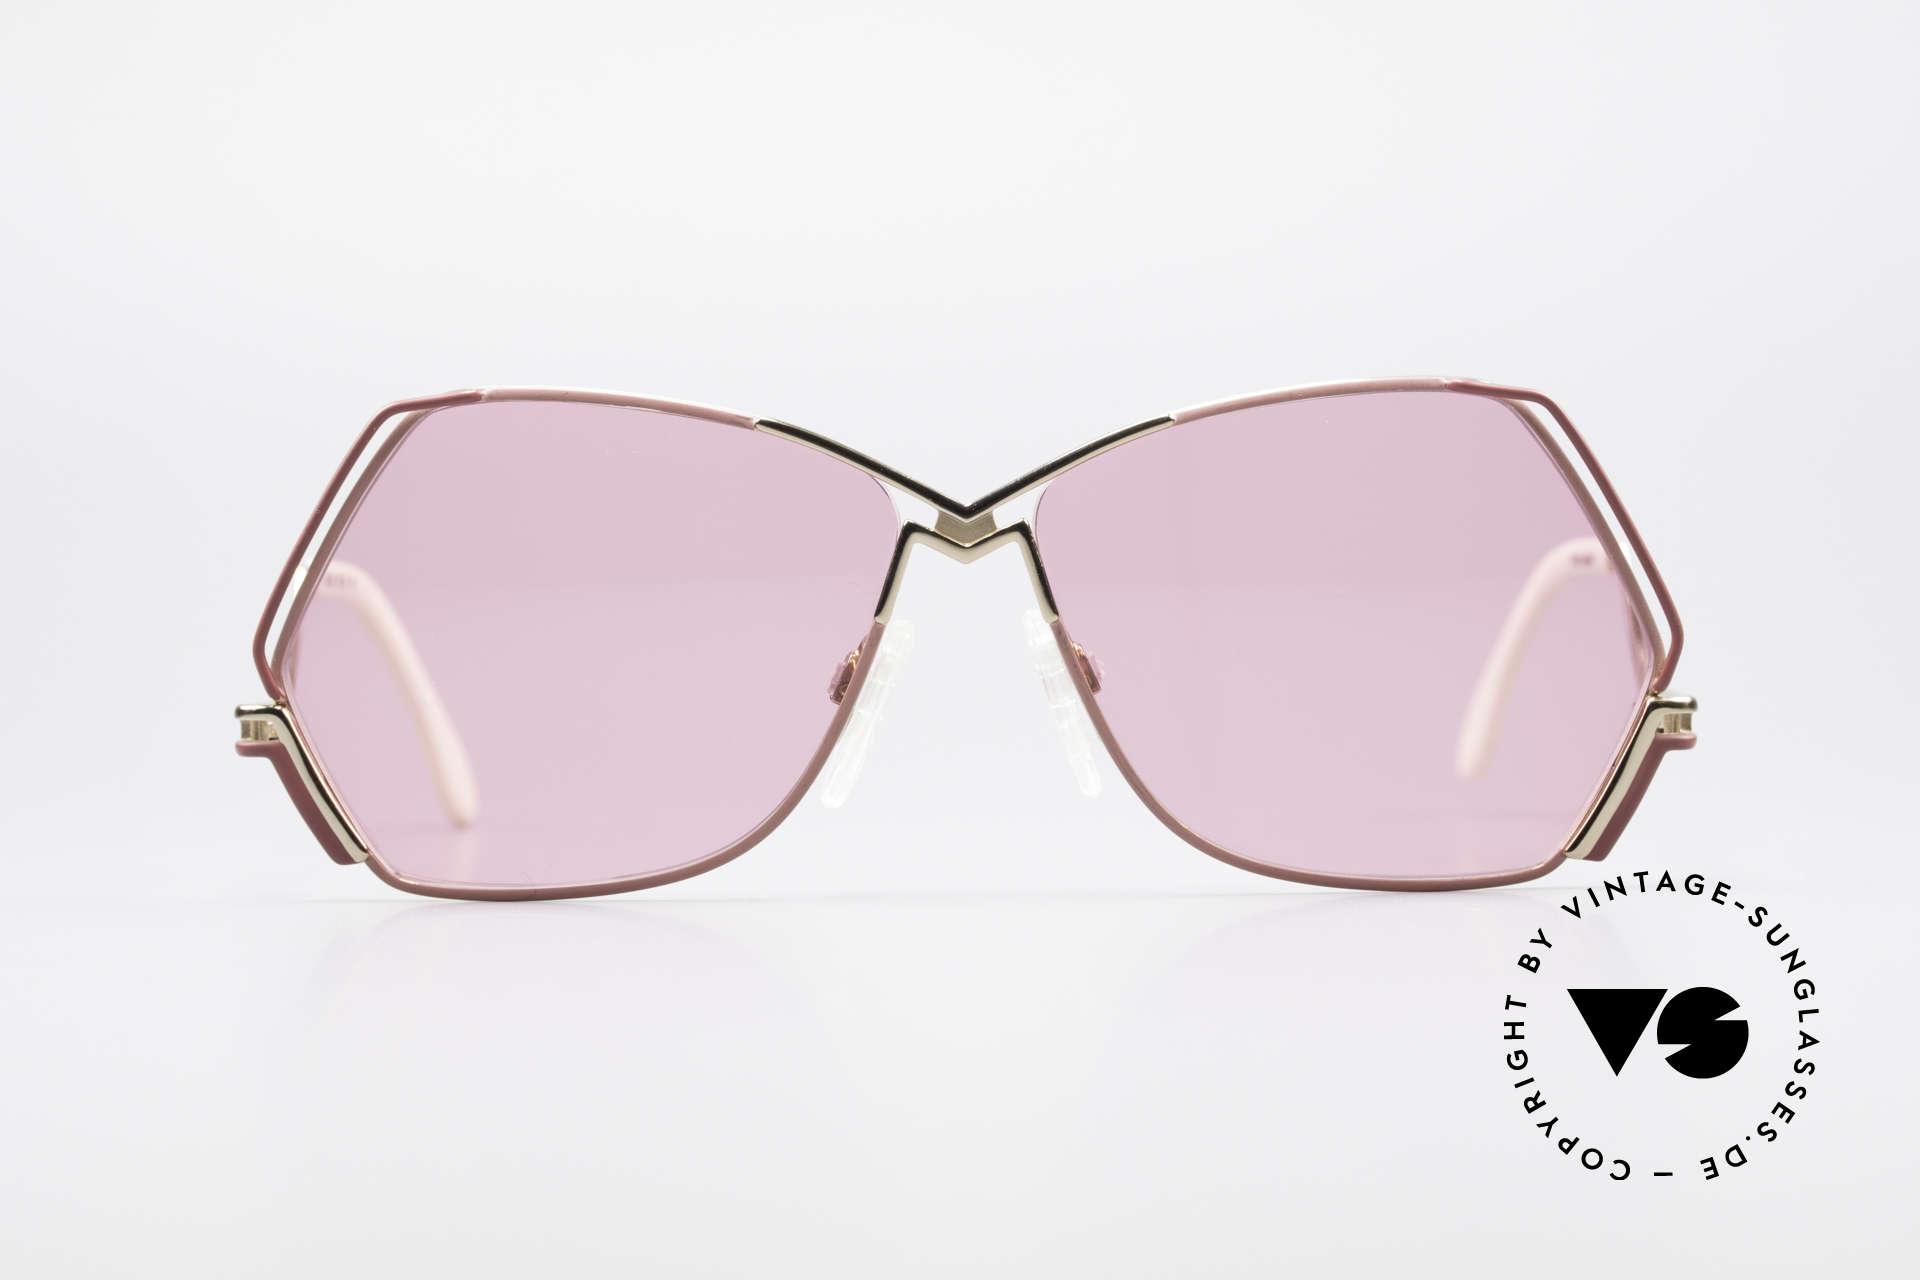 Cazal 226 Pink Vintage Ladies Sunglasses, enchanting creation by Mr. CAri ZALloni (Mr. CAZAL), Made for Women